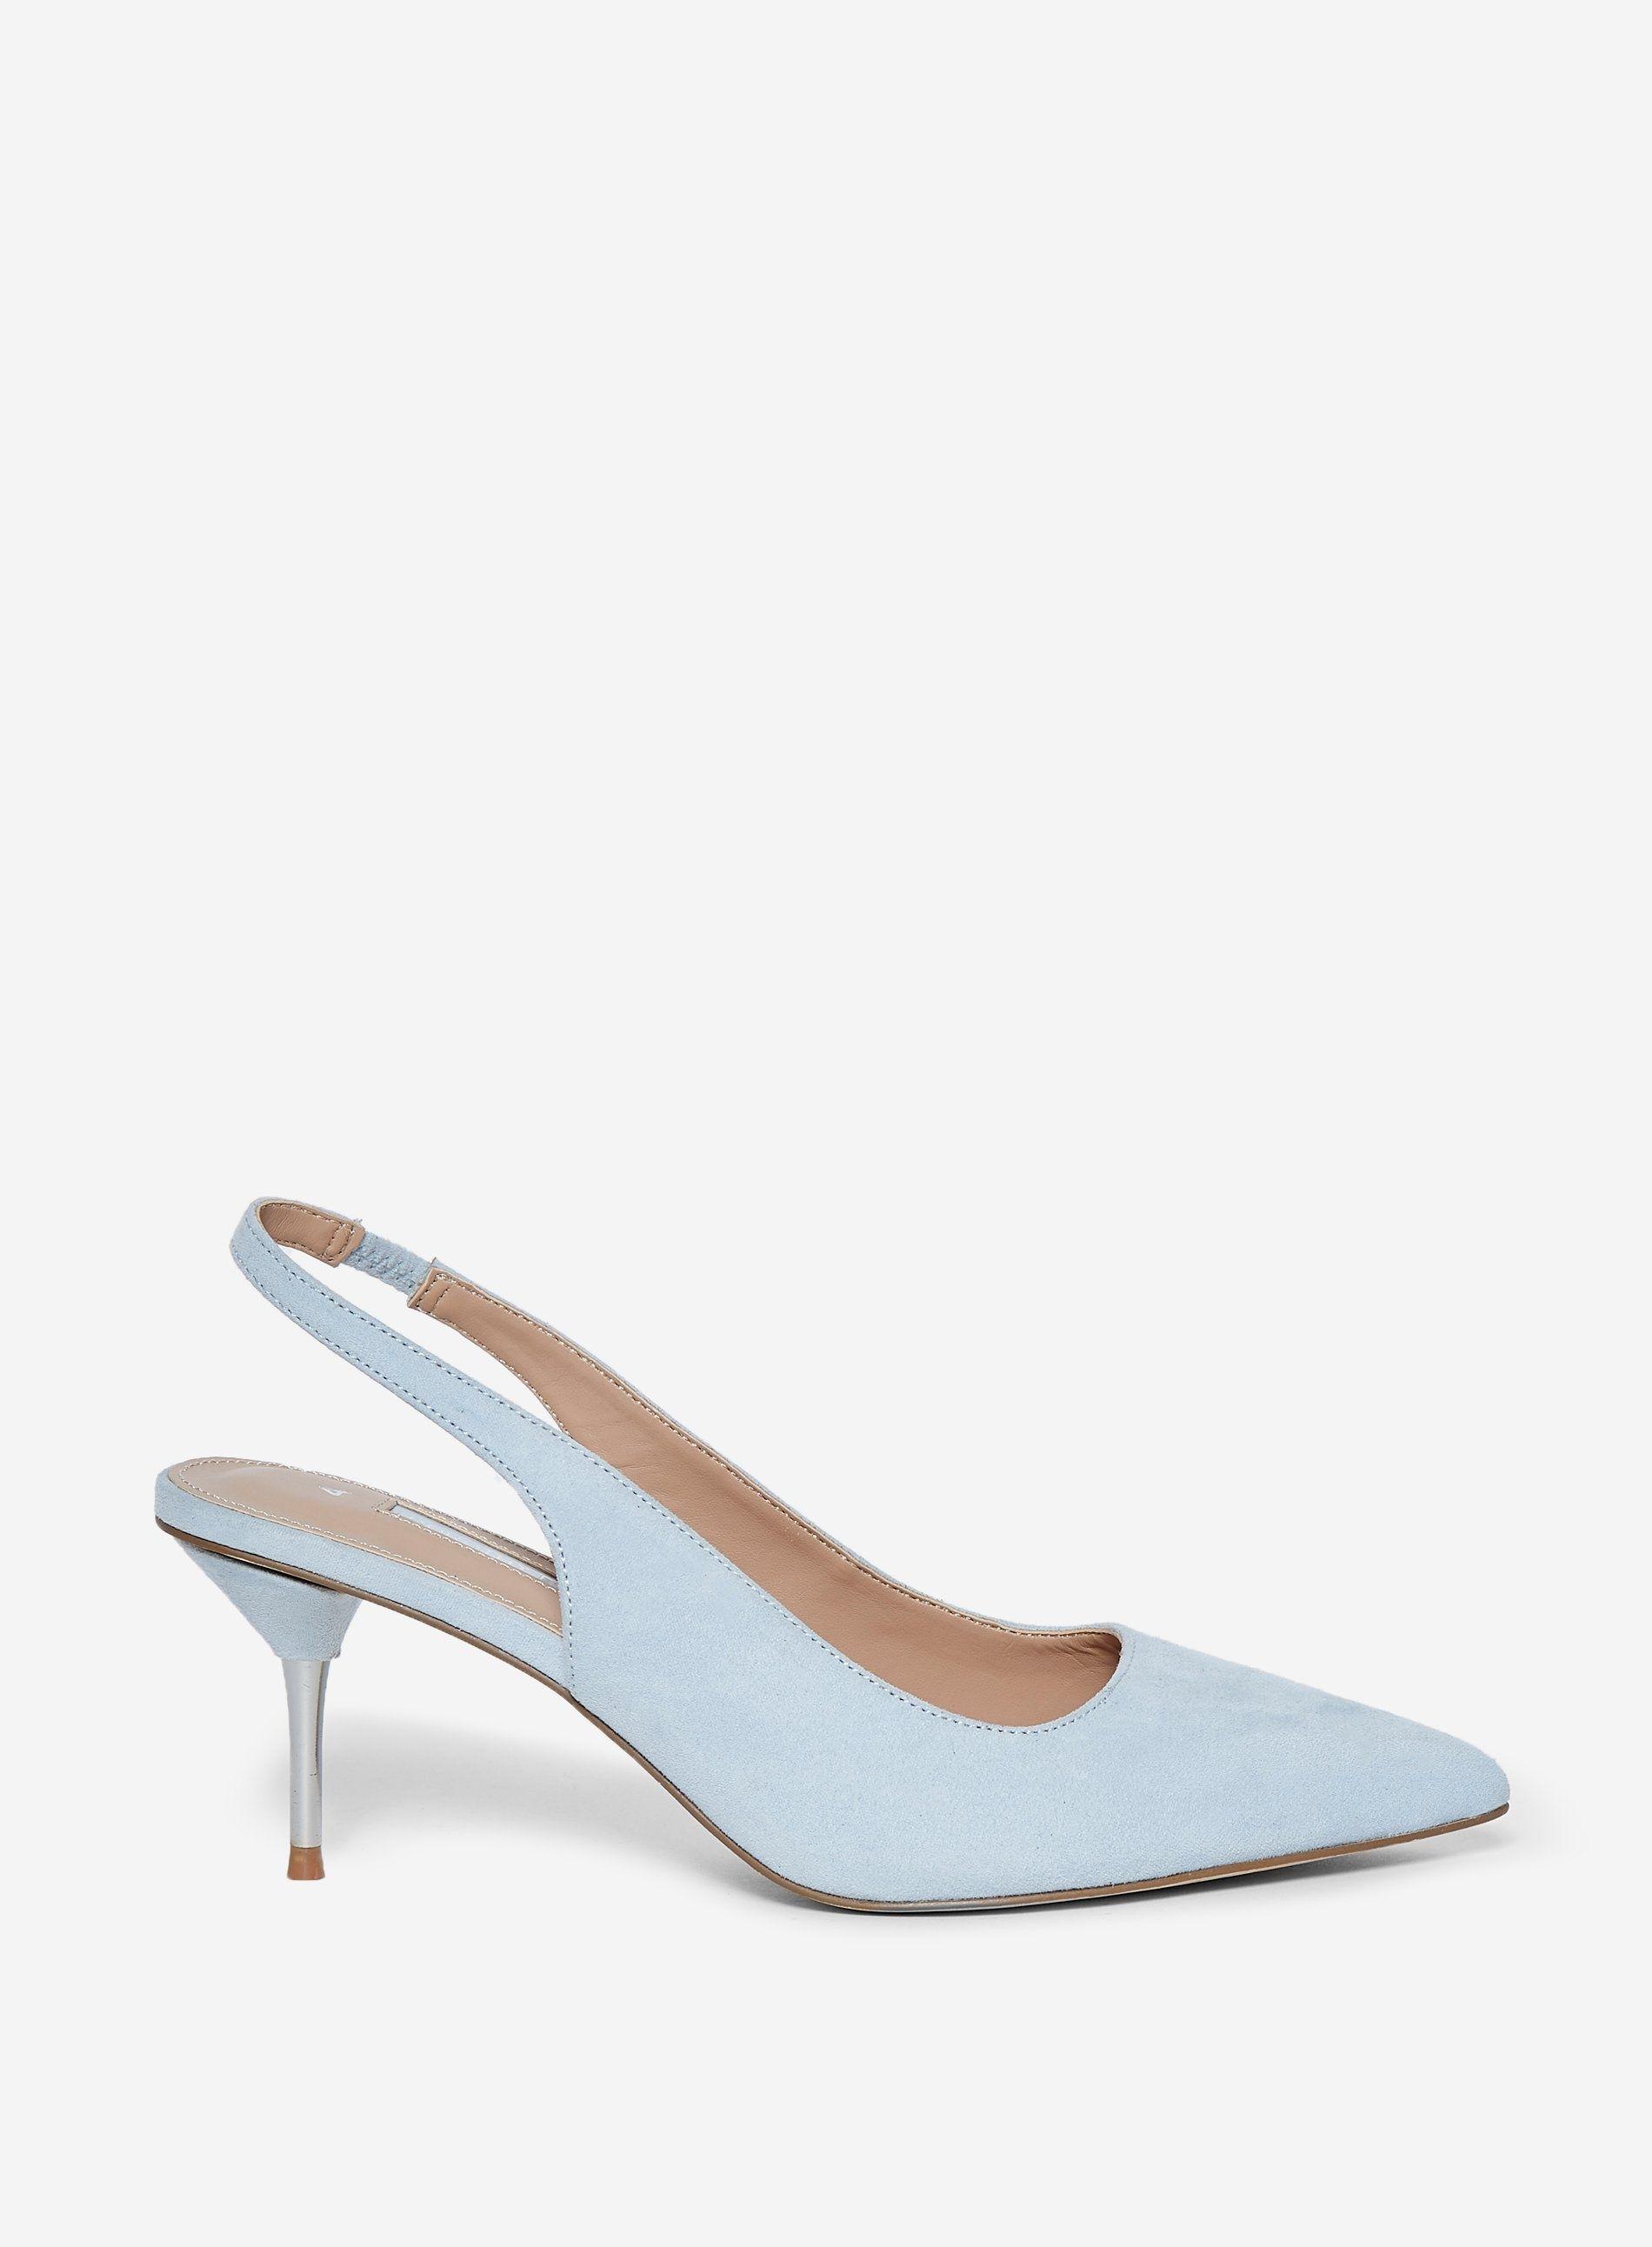 Dorothy Perkins Womens Blue Ellie Court Shoes Slingback Kitten Heel Pointed Toe